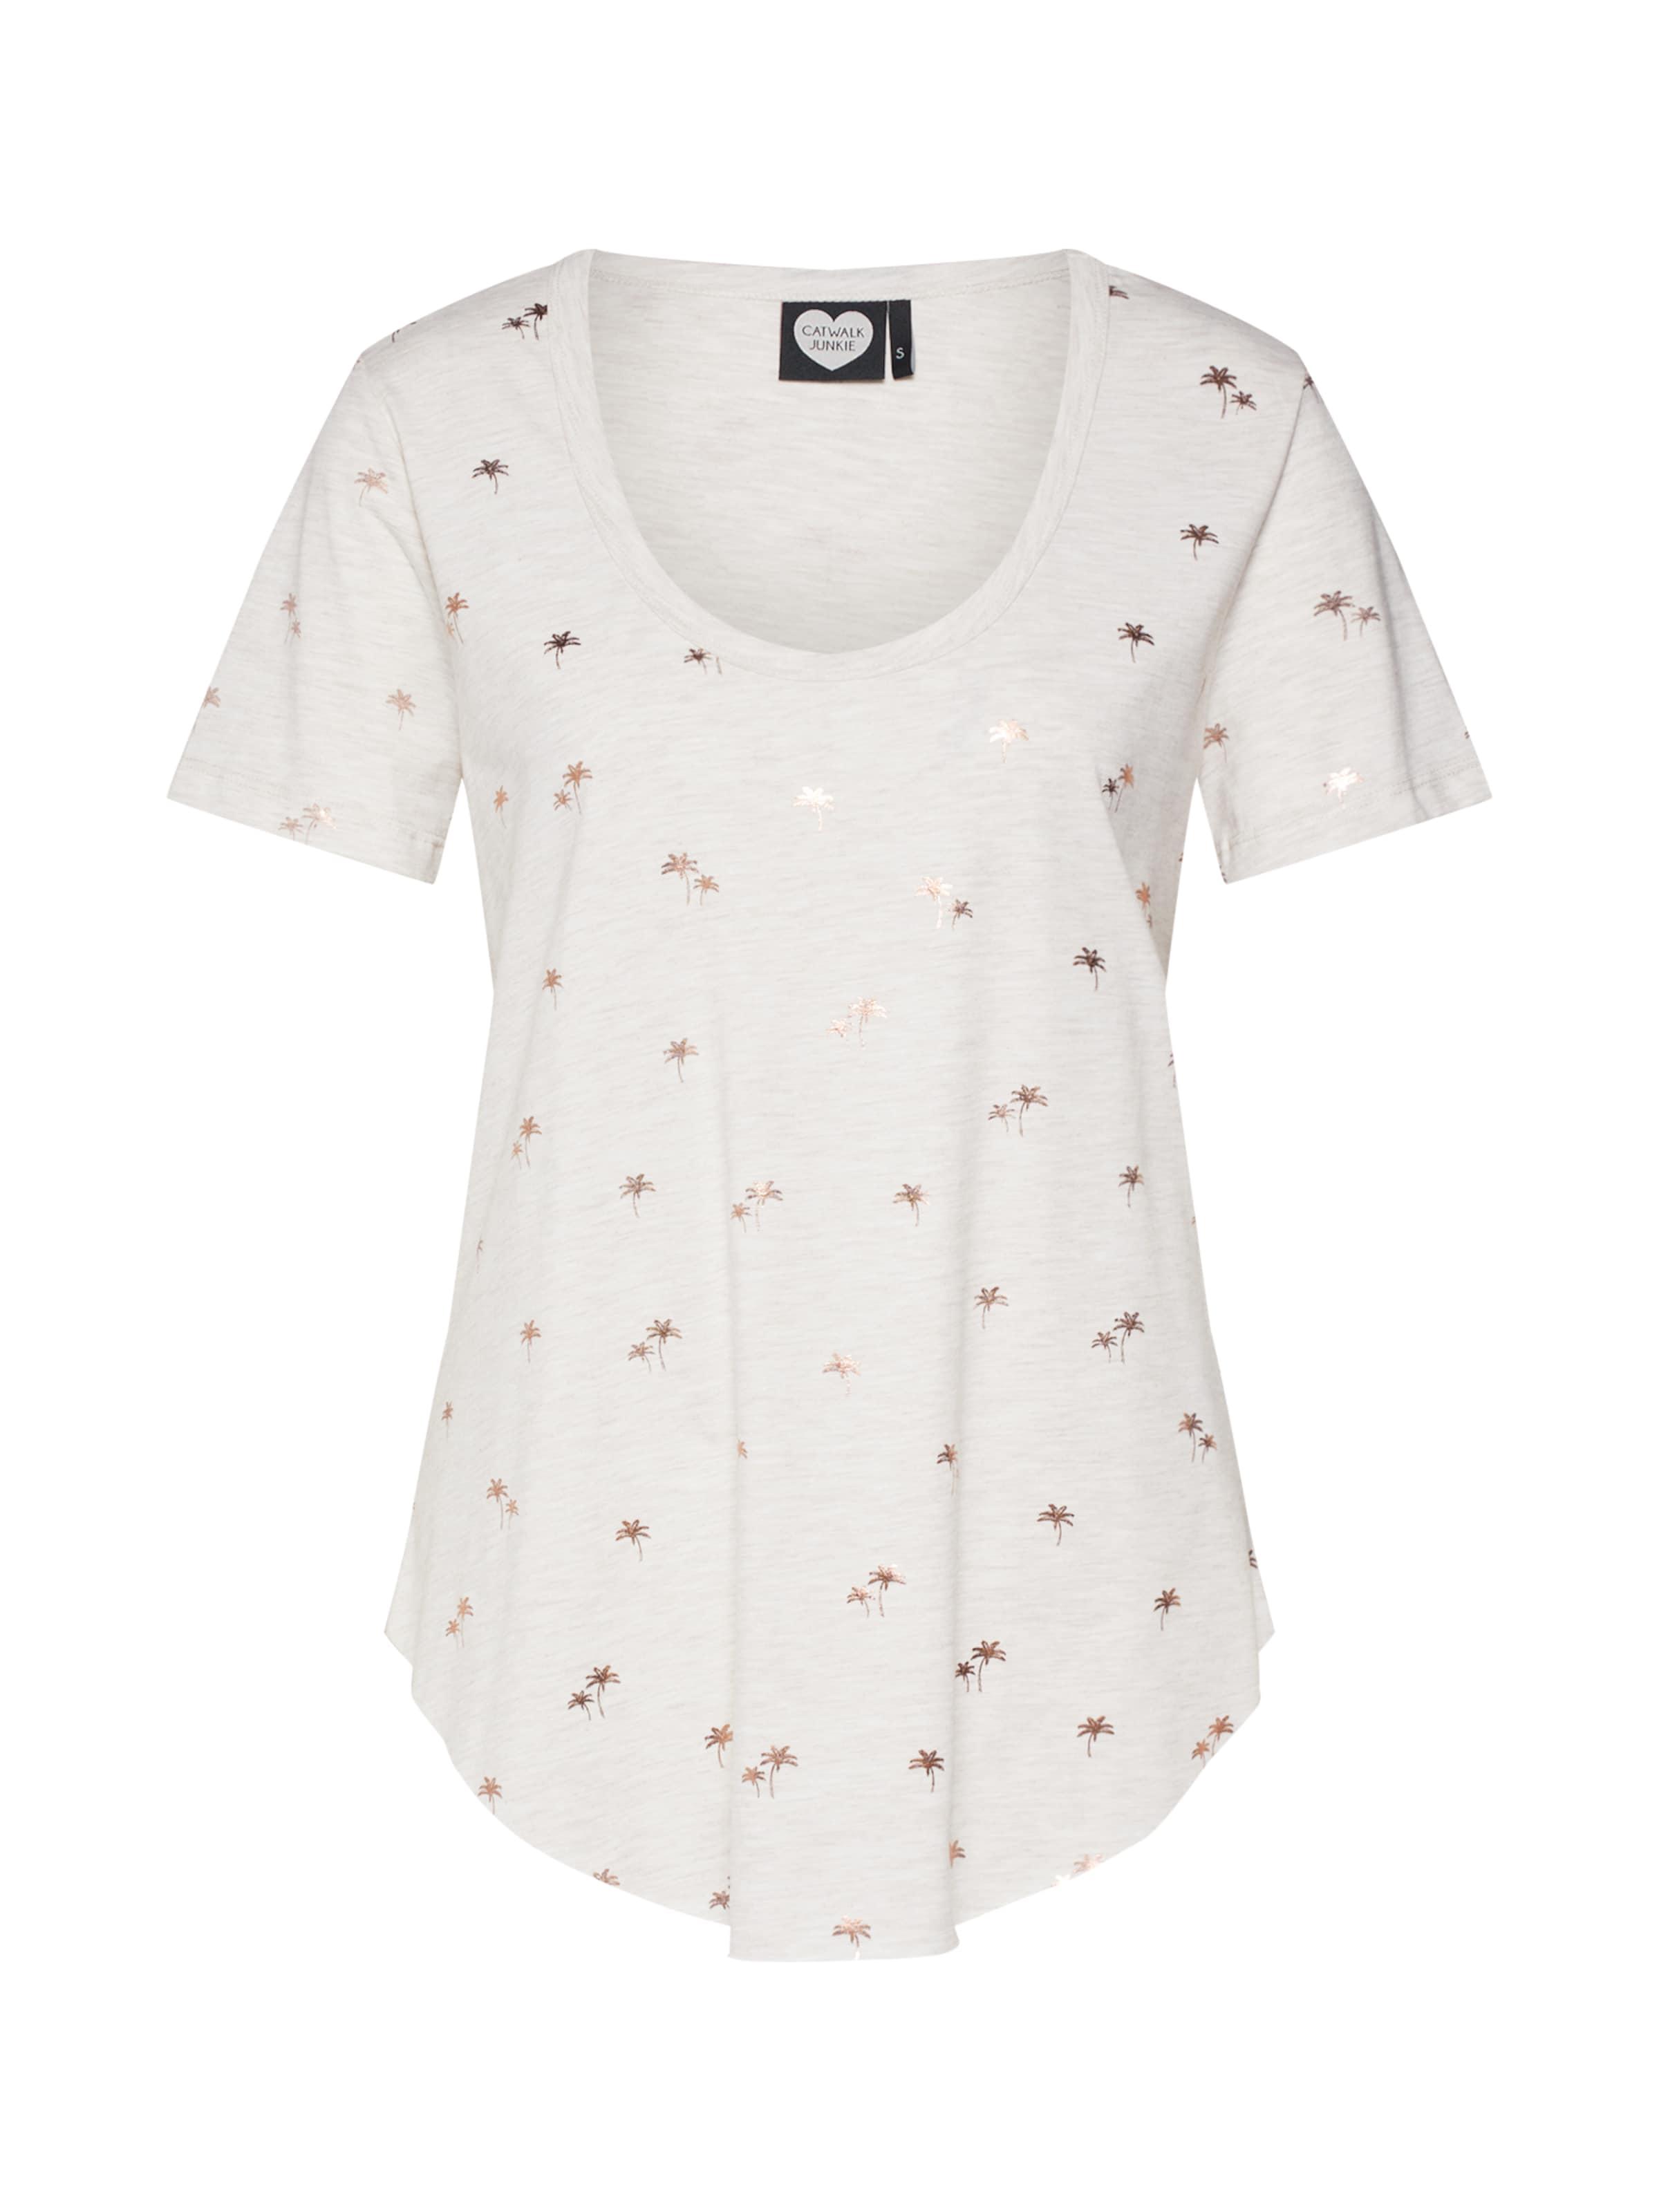 T Tropical Catwalk shirt 'ts Mel' En Junkie CrèmeOr thsdCQxrB